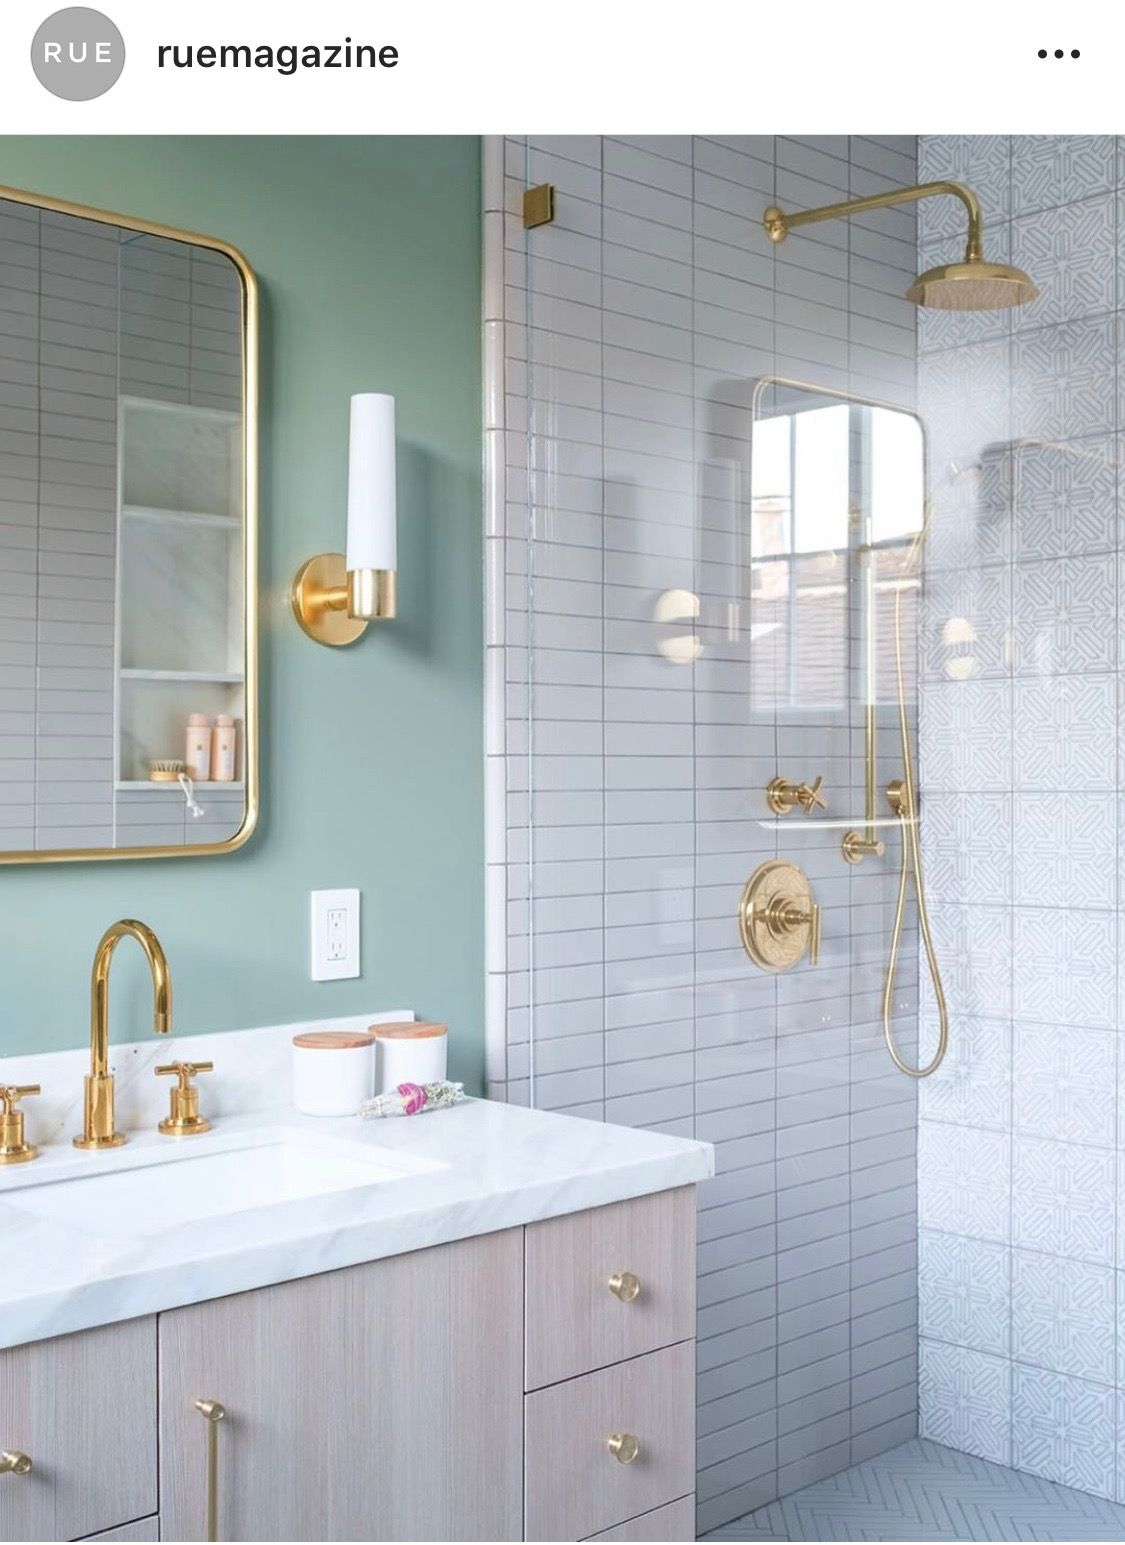 Bathroom Decor Walmart Bathroom Decor With Floating Shelves Bathroom Decor Sims 3 How To D In 2020 Master Bathroom Makeover Bathroom Design Small Bathroom Makeover